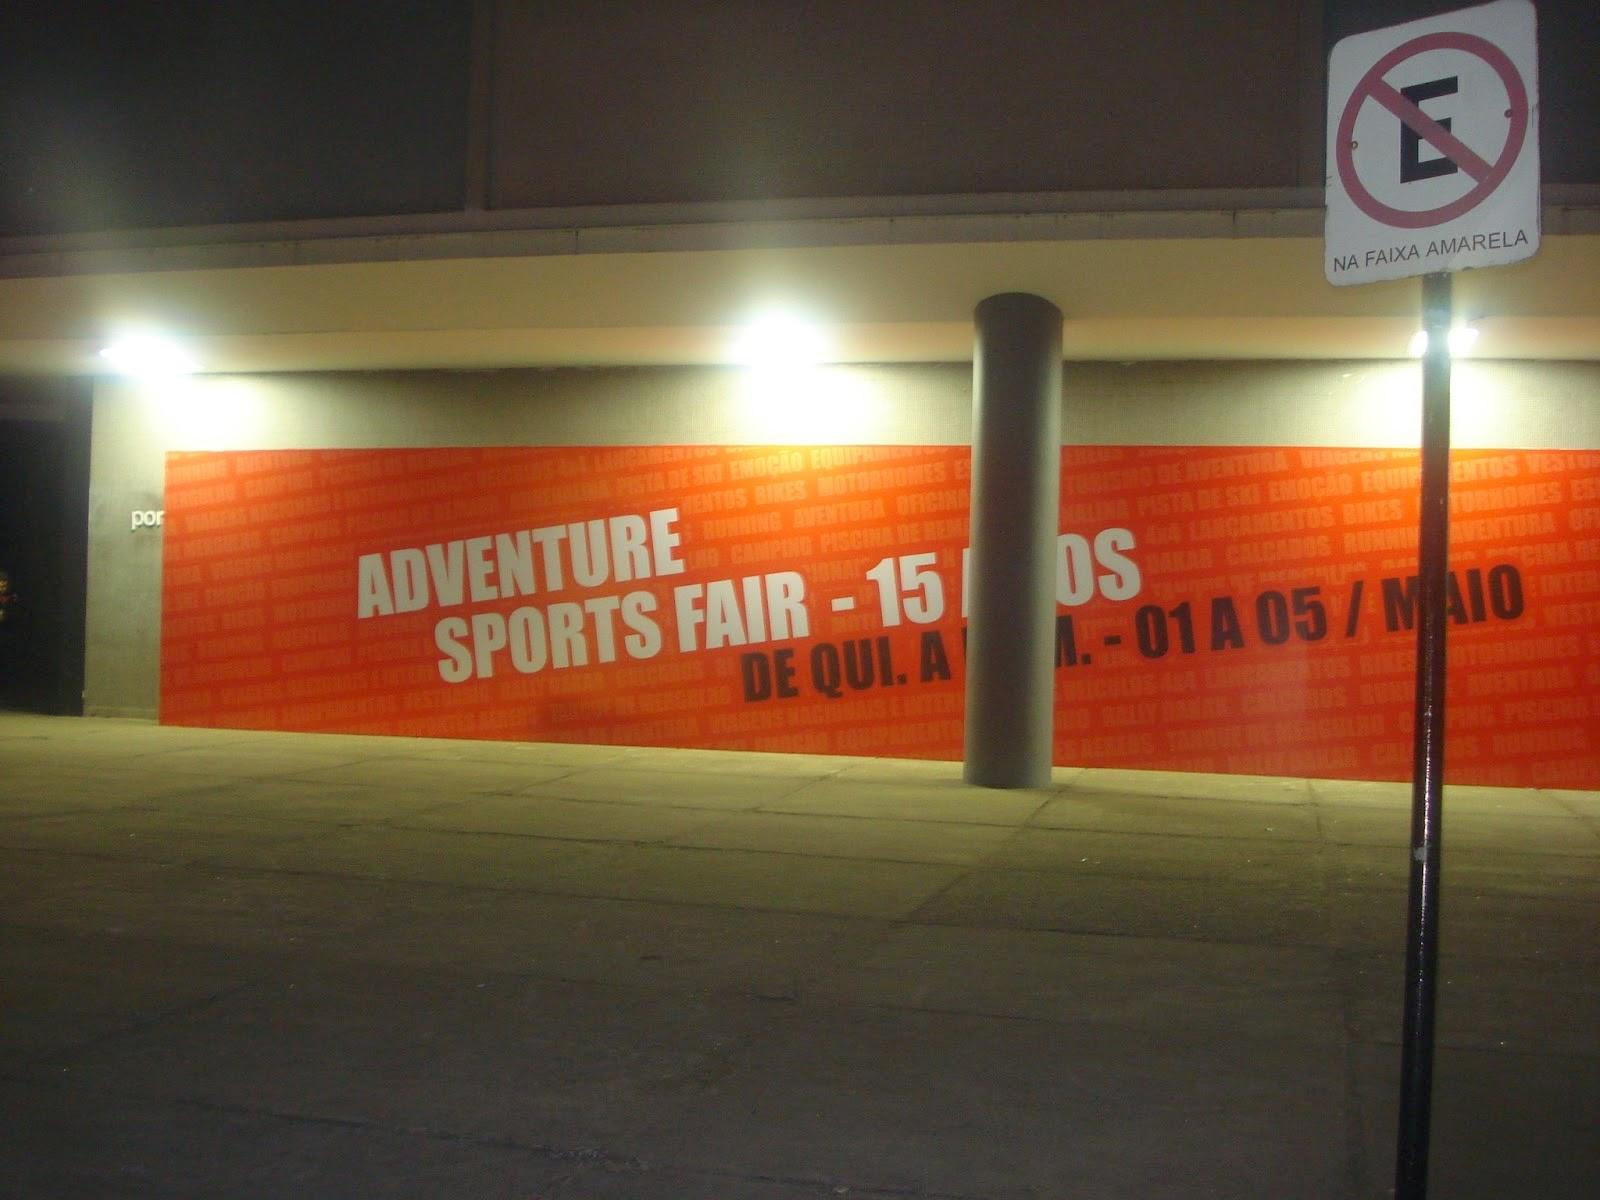 Ramp in Box na Adventure Sports Fair Skate no Ibirapuera SP 7